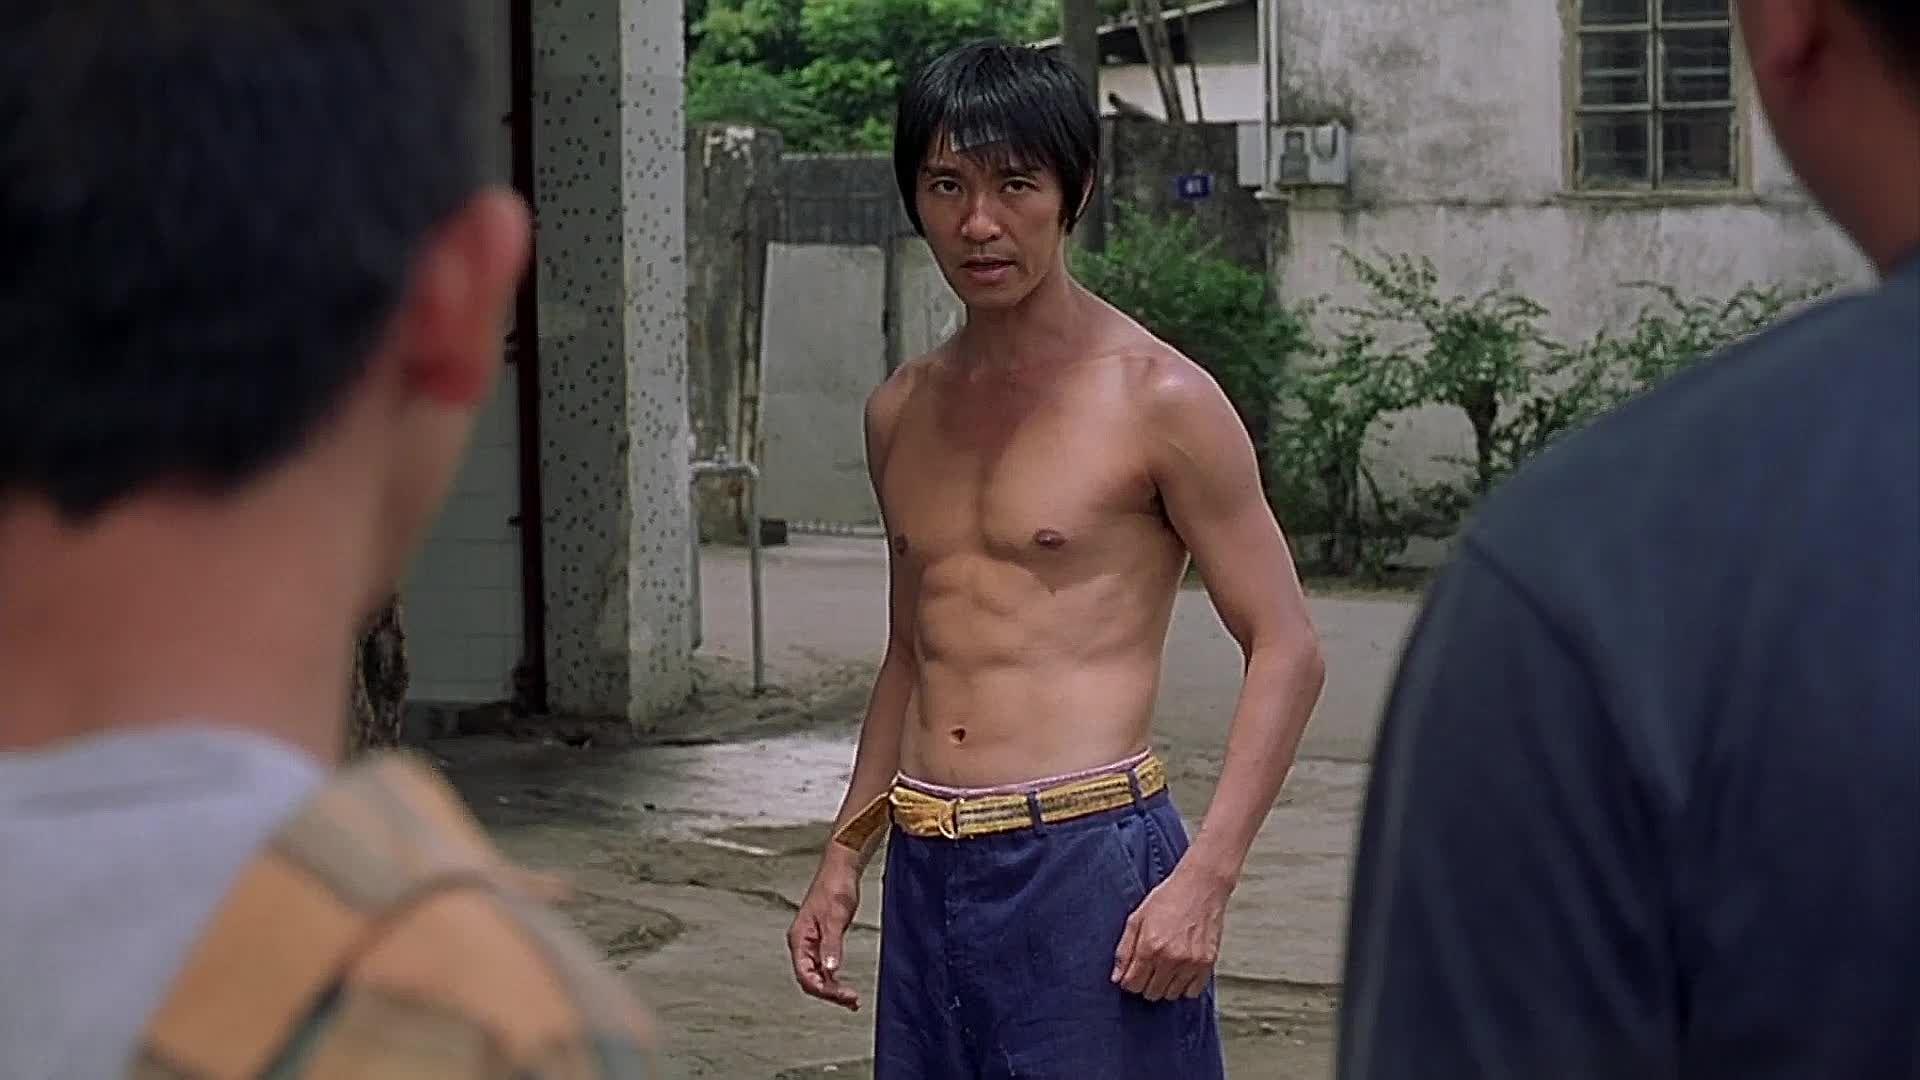 M A A C Maac Fight Of The Day Stephen Chow Vs Street Thugs From Shaolin Soccer Shaolin Soccer Shaolin Soccer